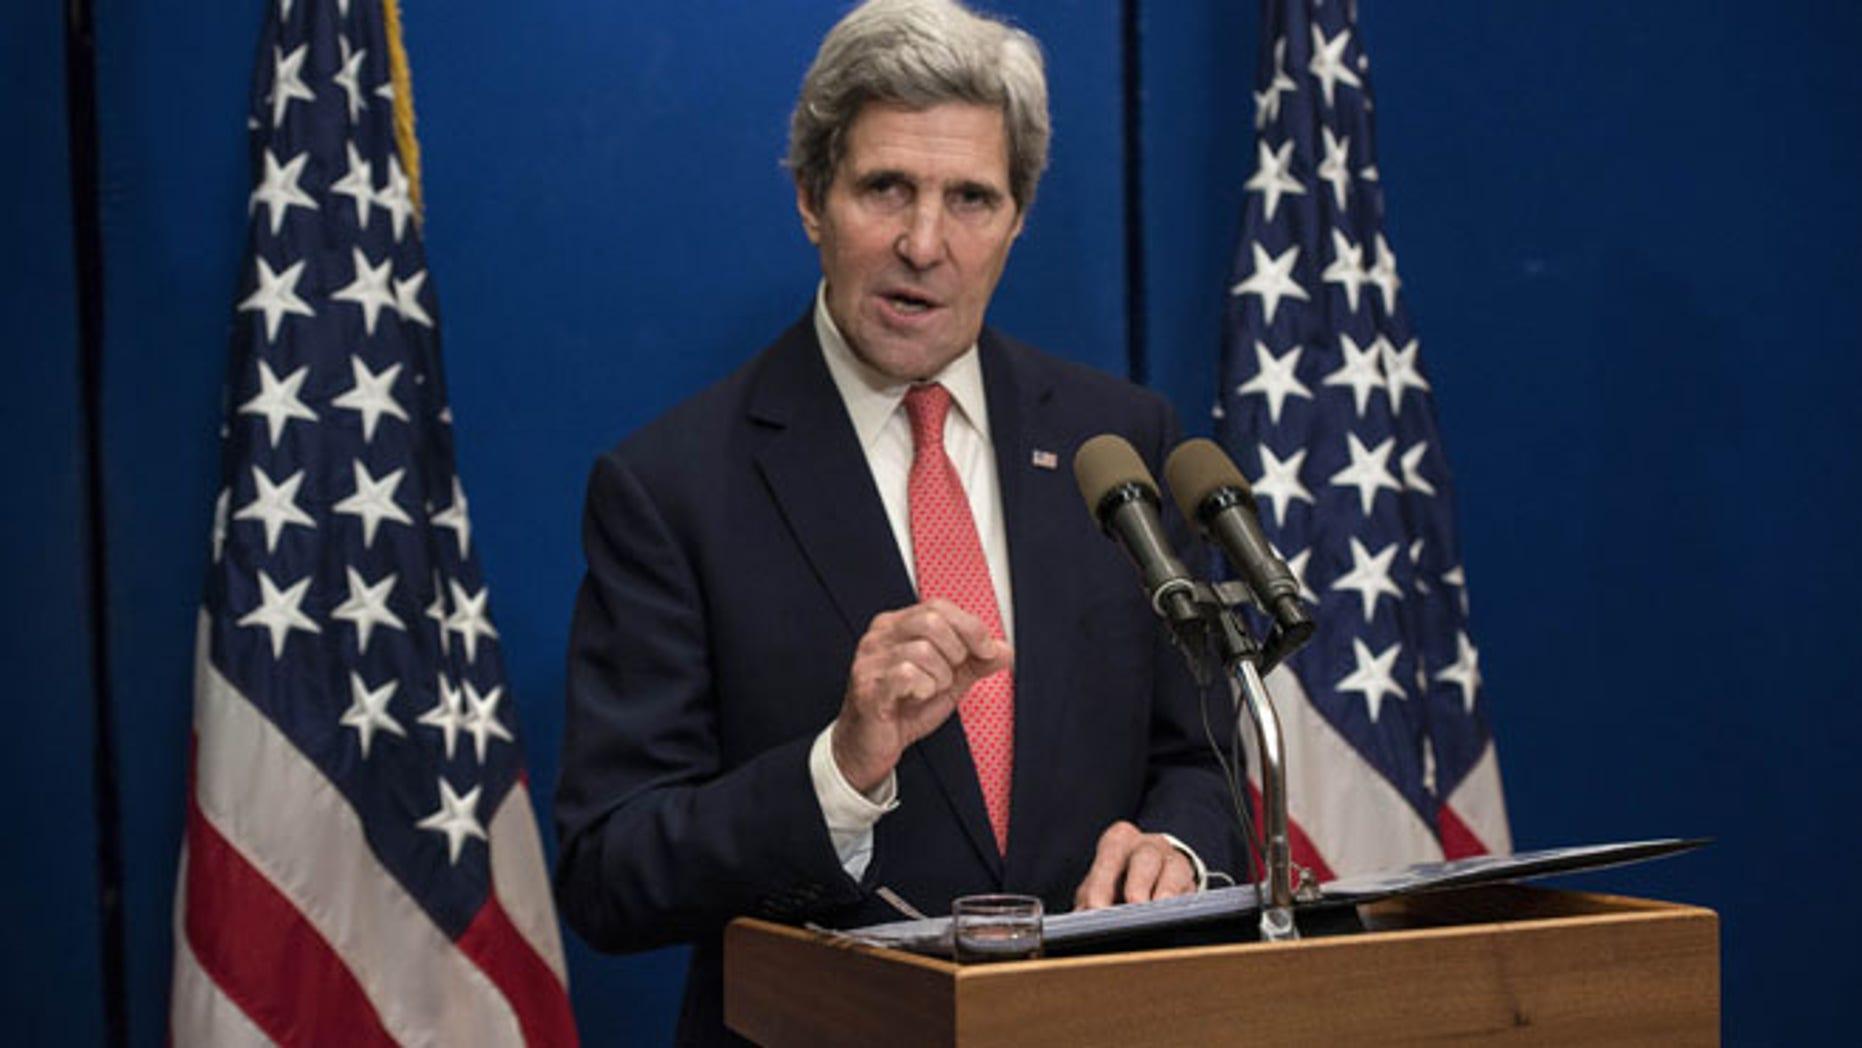 Jan. 5, 2014: U.S. Secretary of State John Kerry speaks during a press conference at the David Citadel Hotel in Jerusalem.